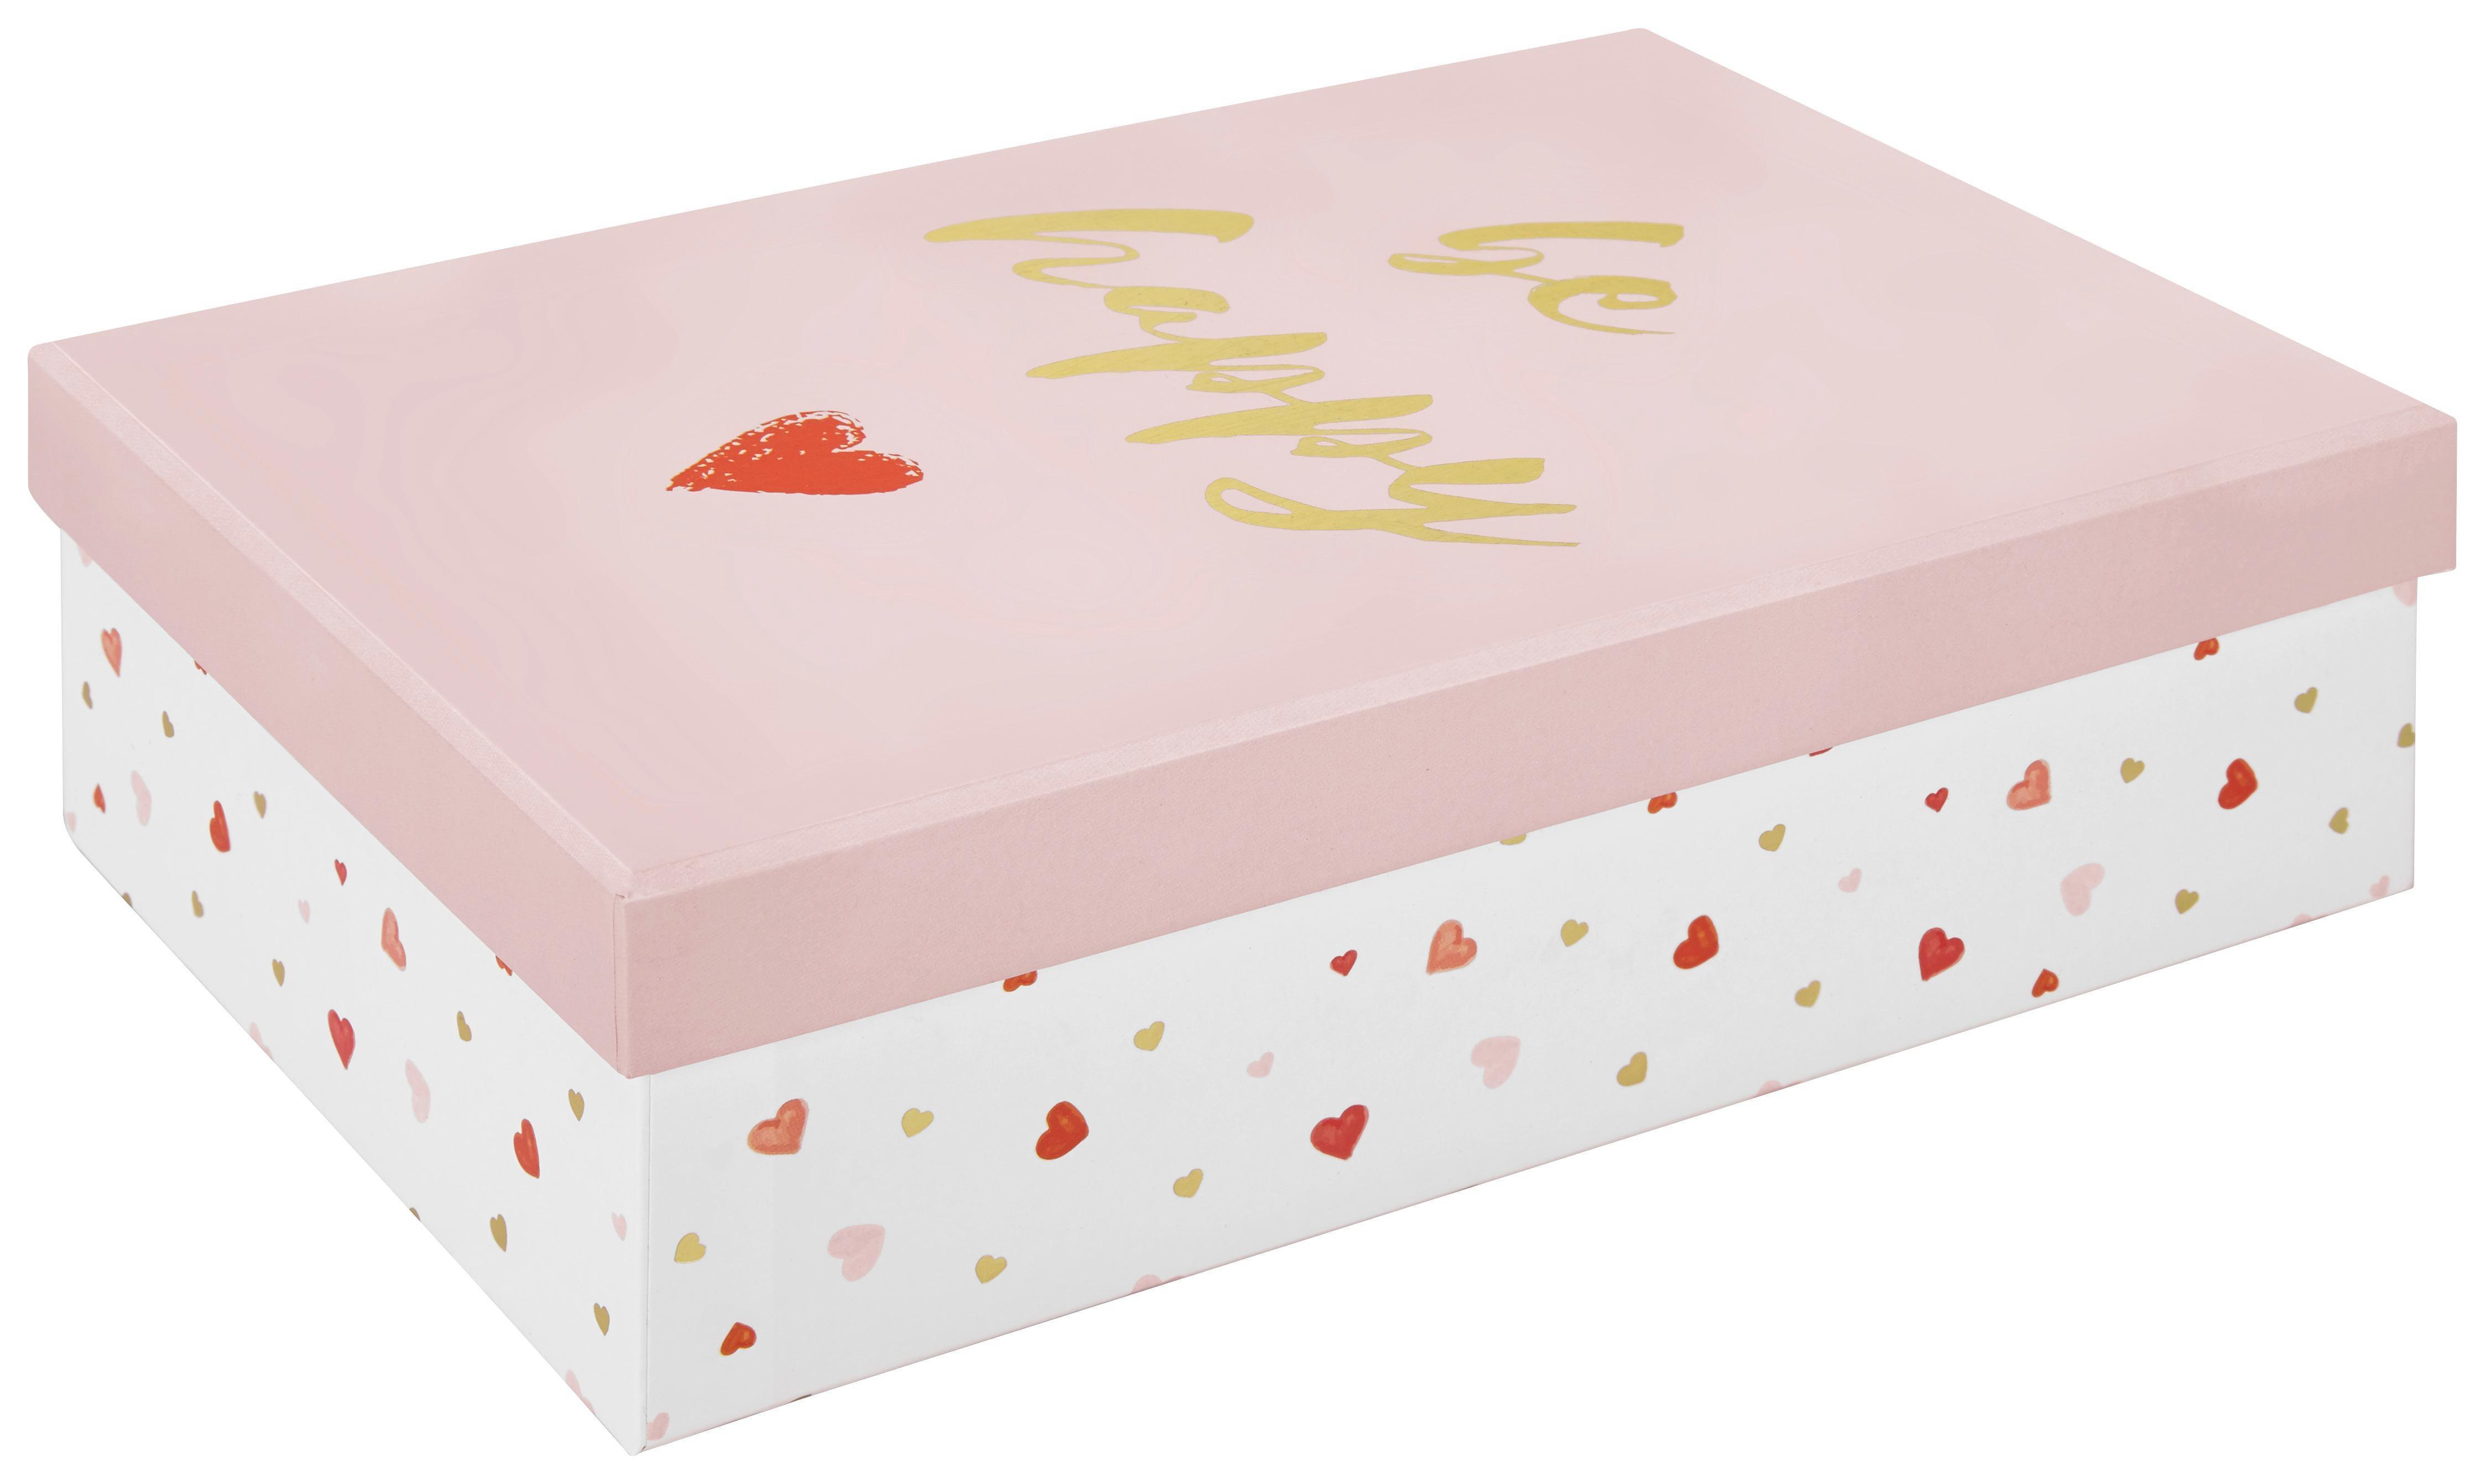 Geschenkbox Dreams in Rosa aus Karton - Rosa, Karton (24/7/16cm) - MÖMAX modern living